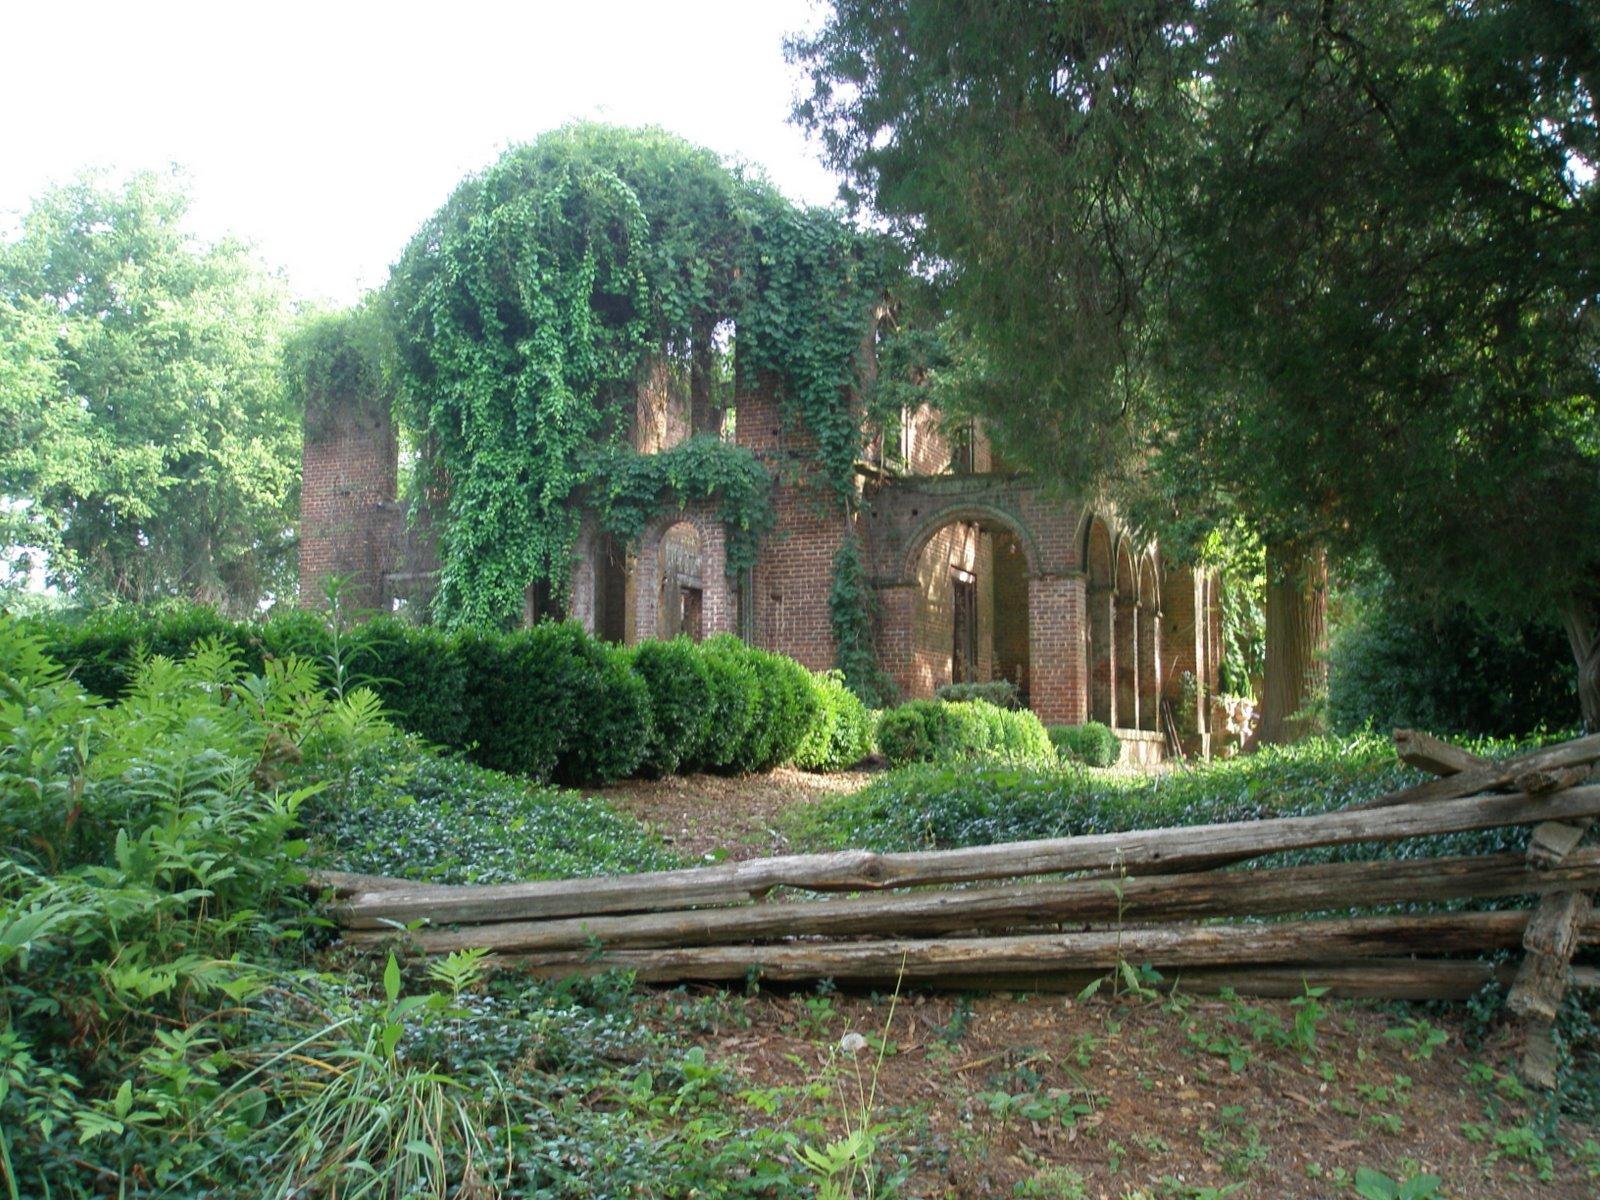 Photographic South: Barnsley Garden mansion ruins